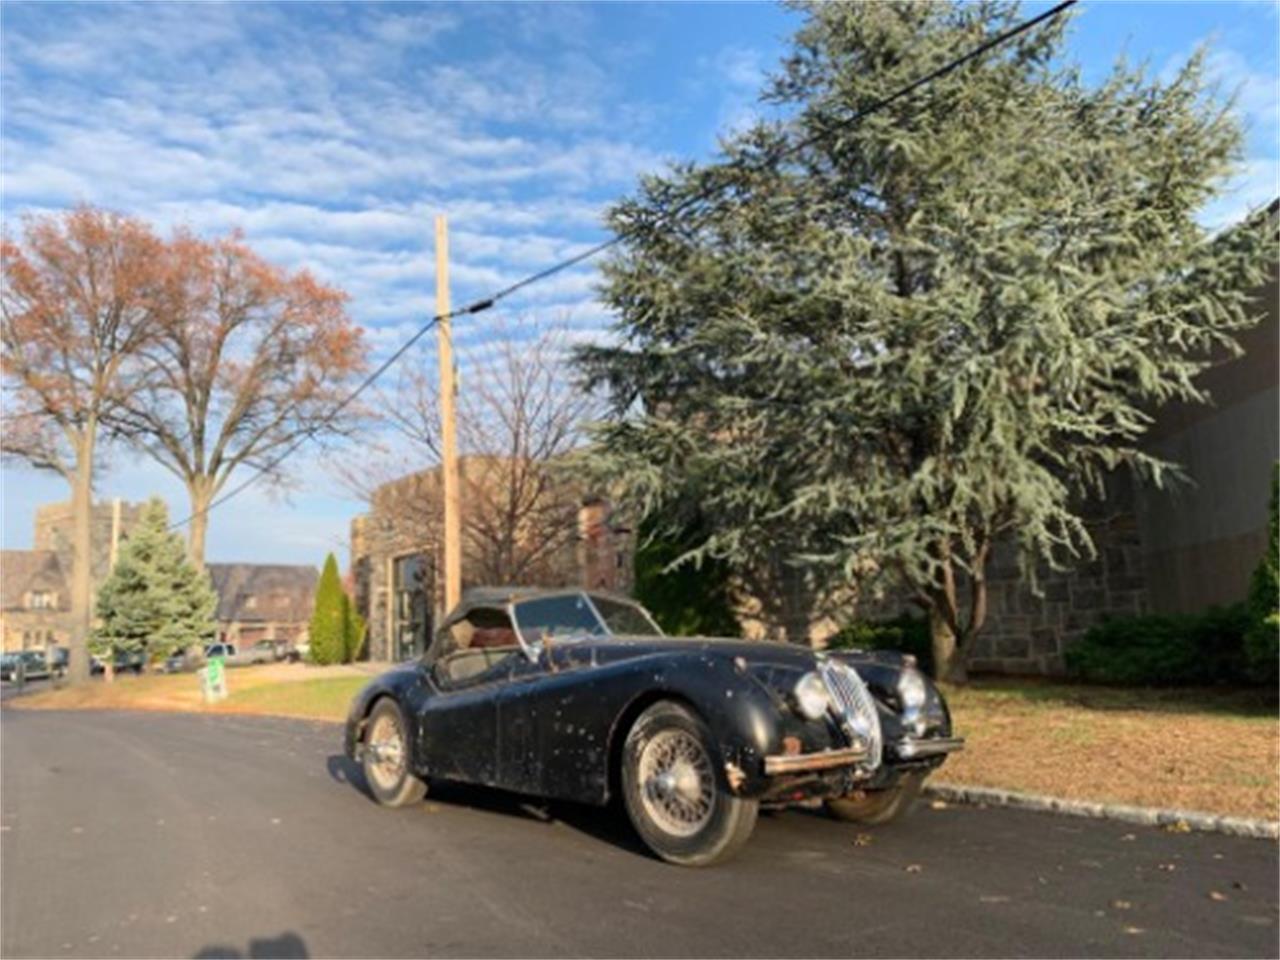 1954 Jaguar XK120 (CC-1301650) for sale in Astoria, New York